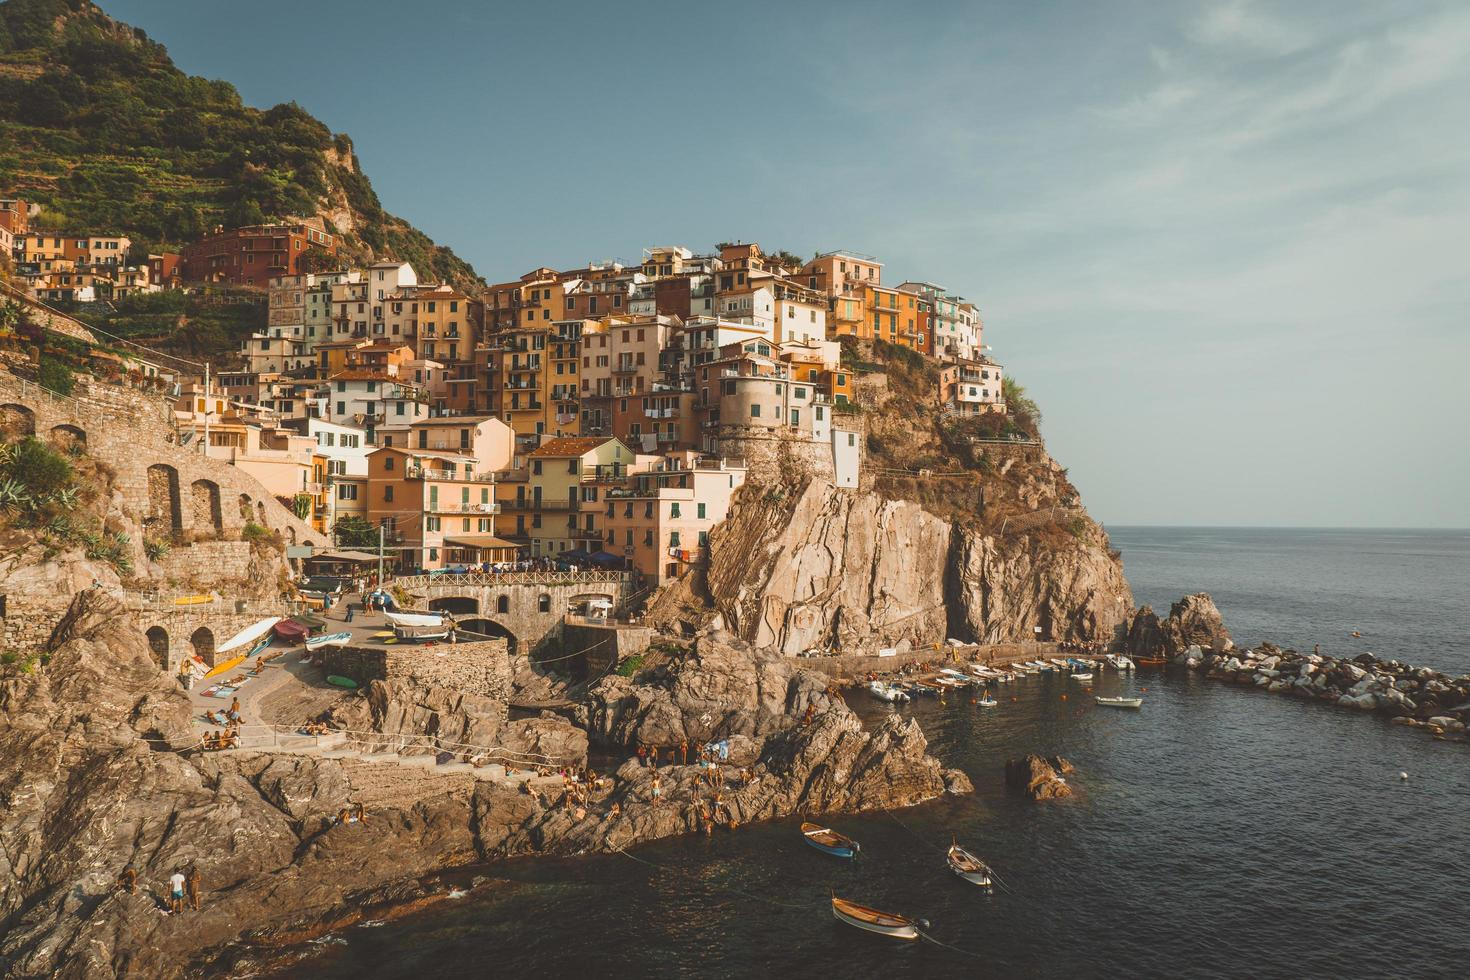 Coastal mountain scene photo